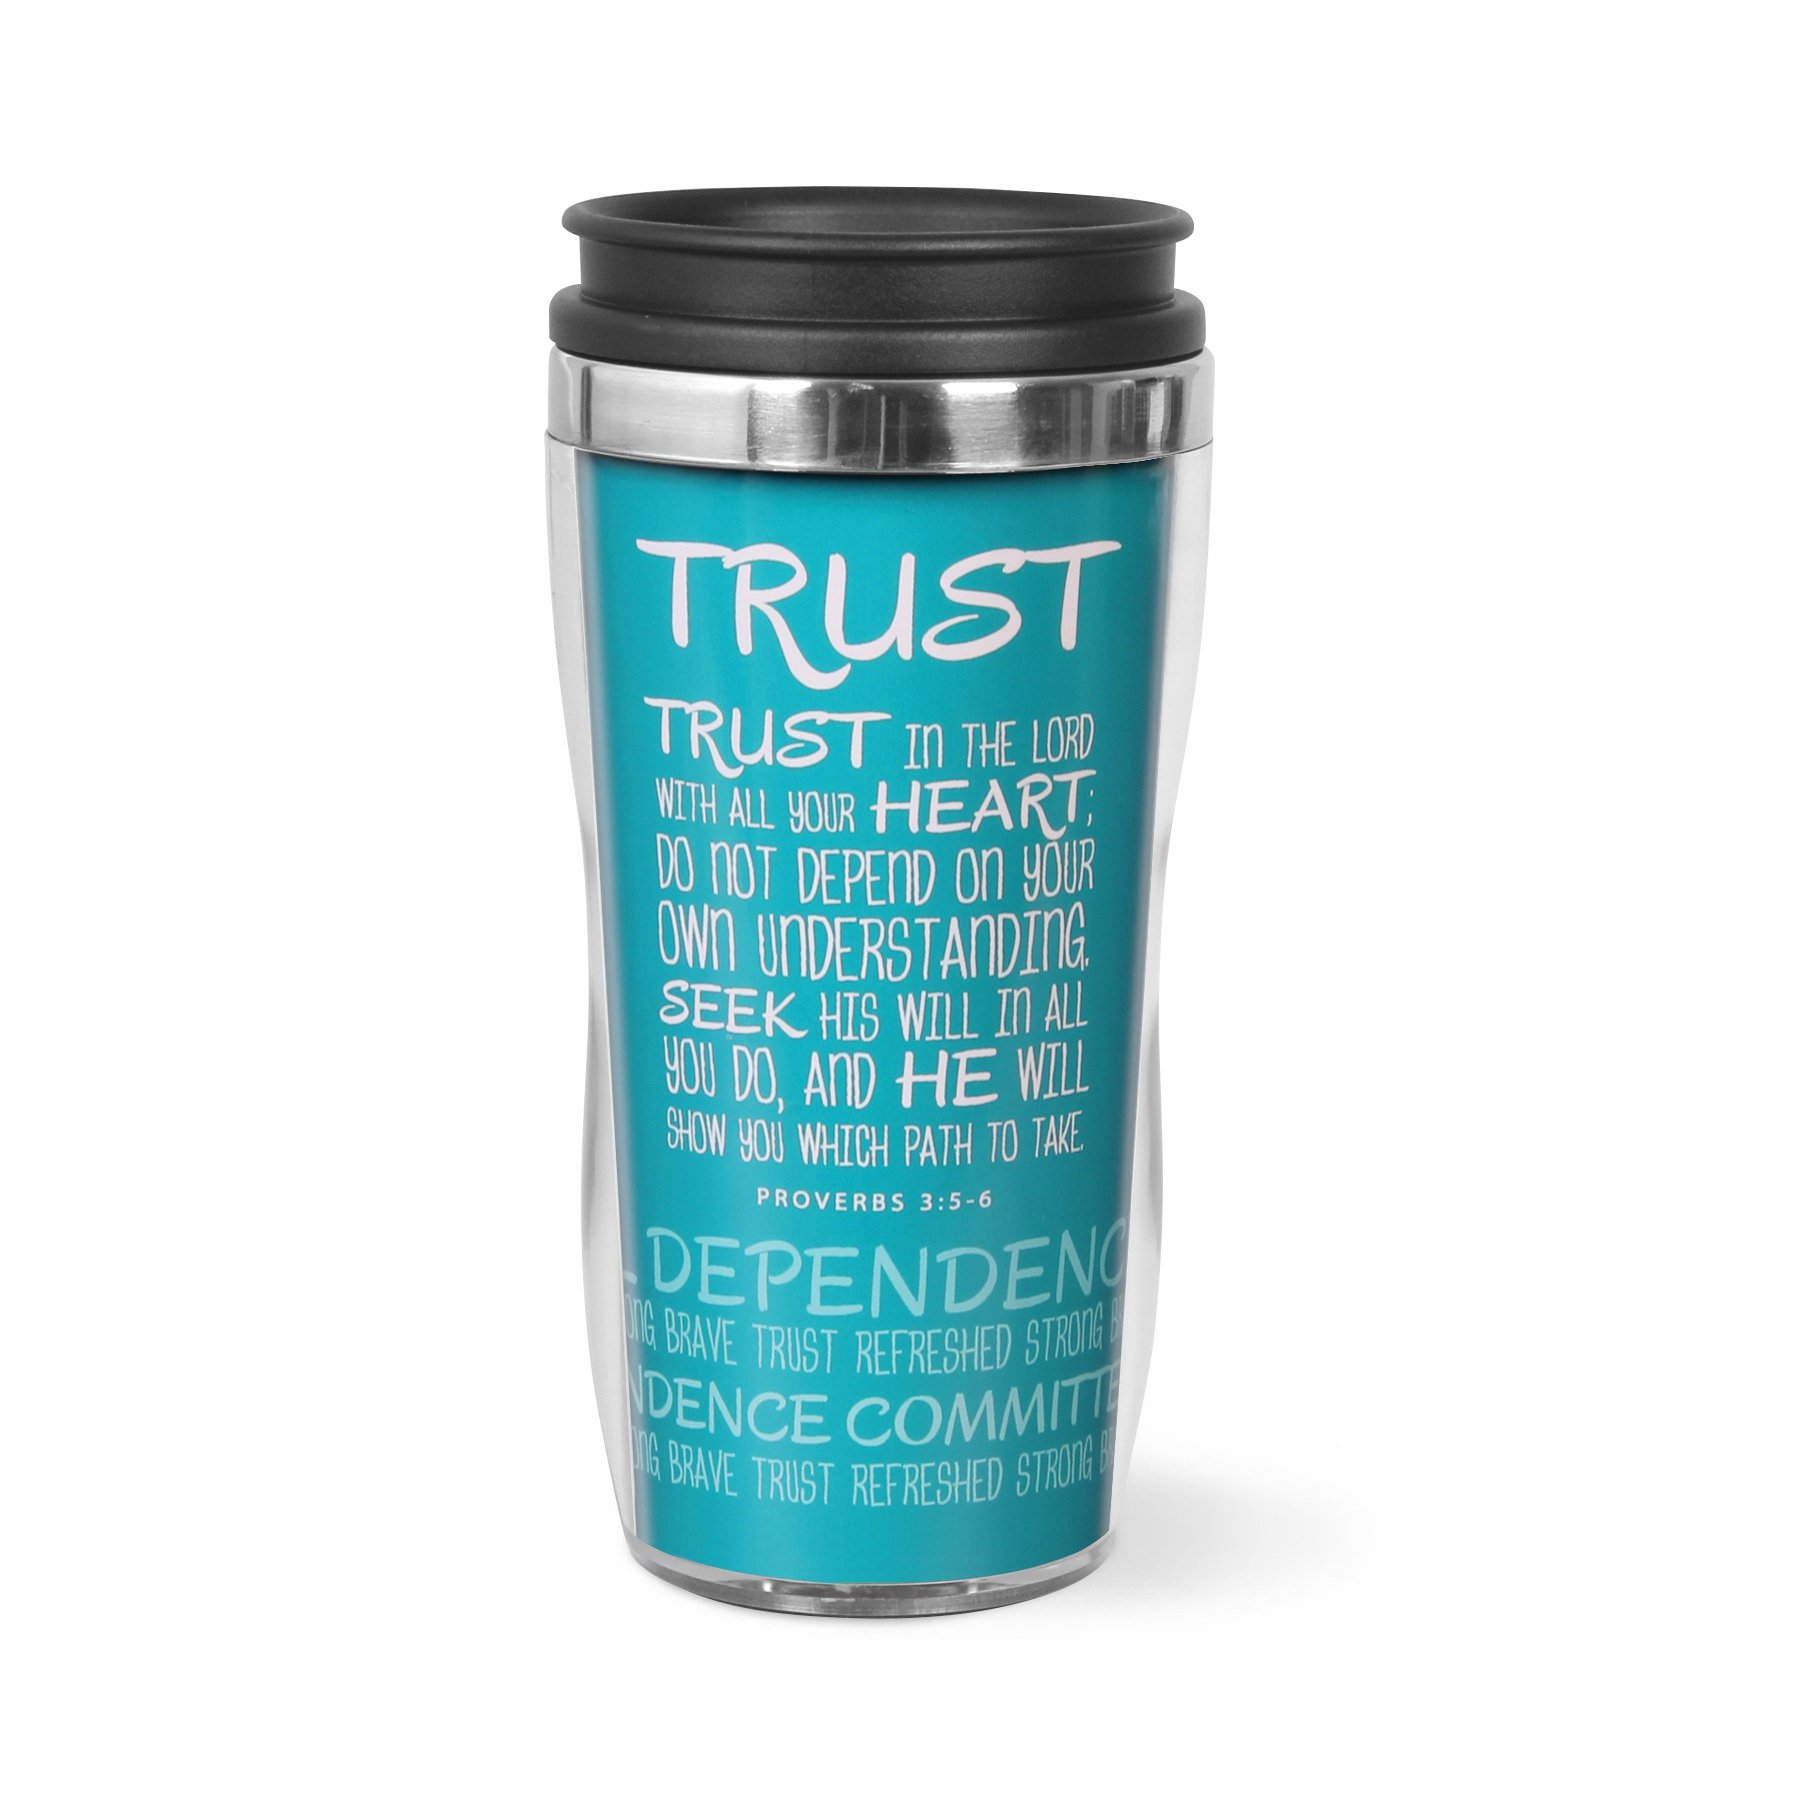 Lighthouse Christian Products Trust Wavy Acrylic/Stainless Steel Tumbler Mug, 13 oz